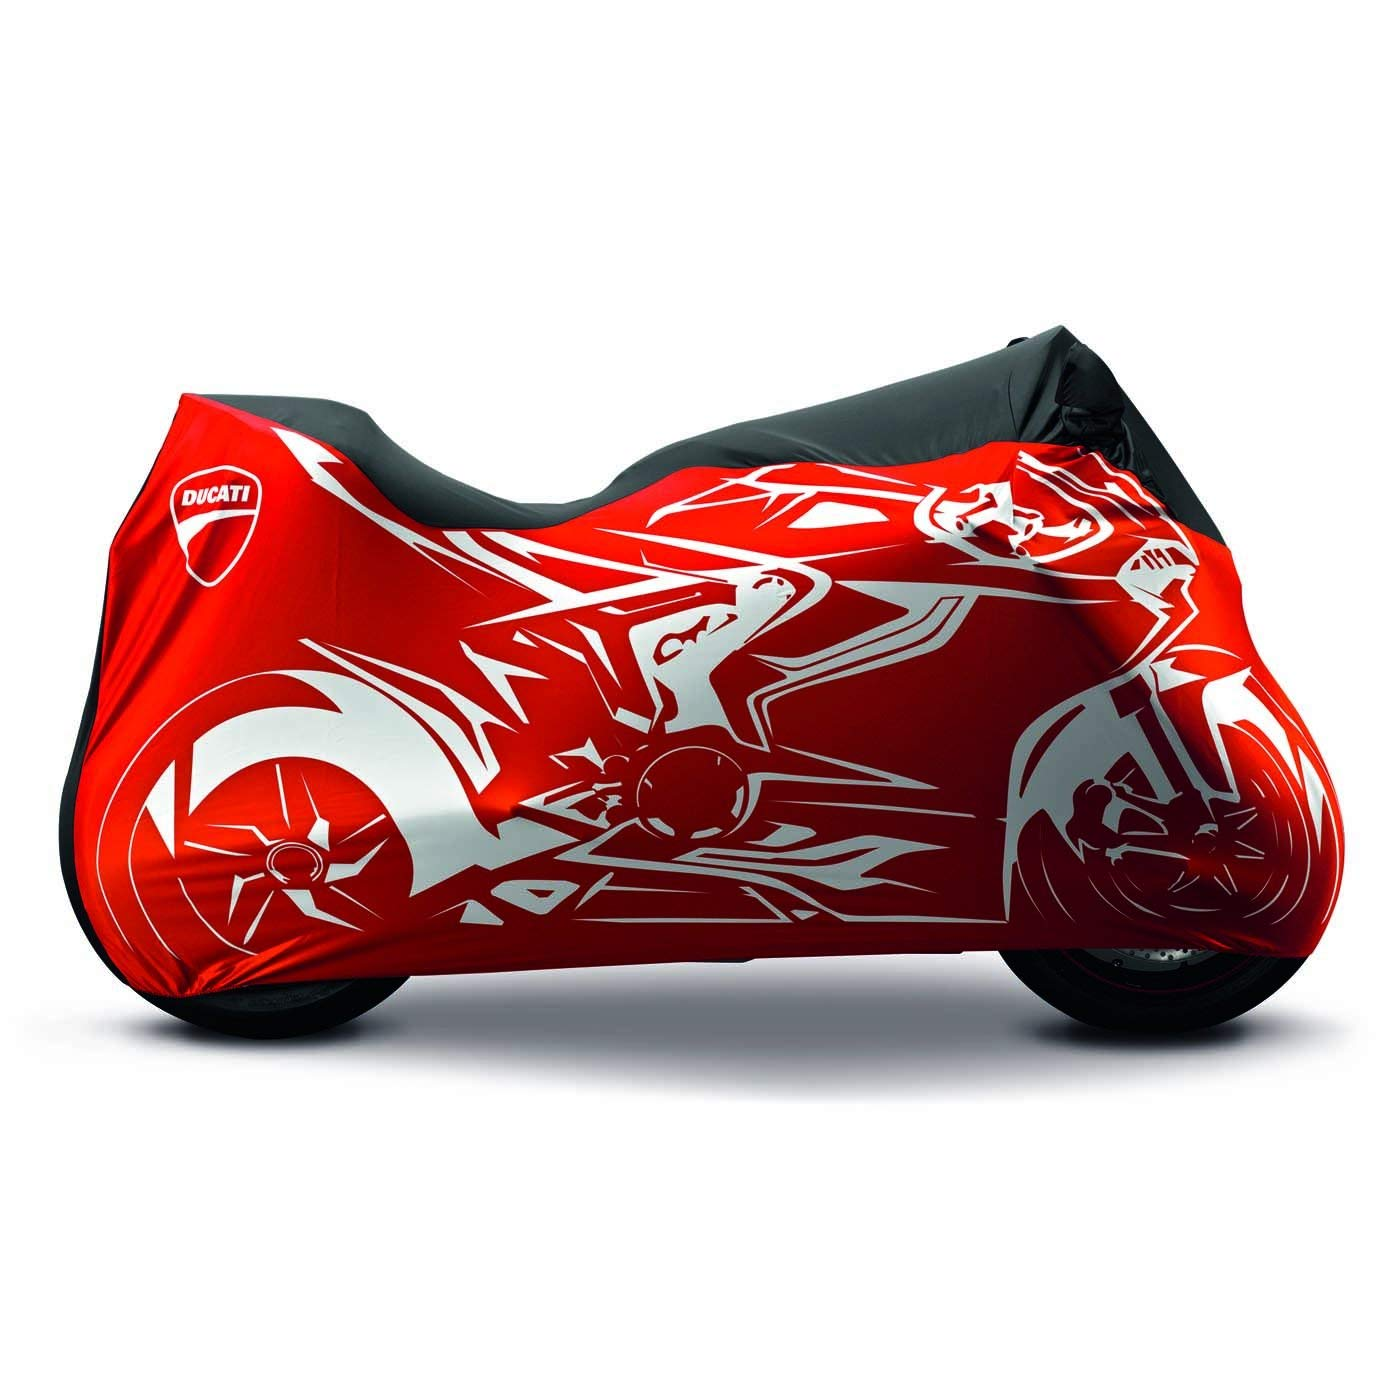 Ducati Panigale Bike Cover